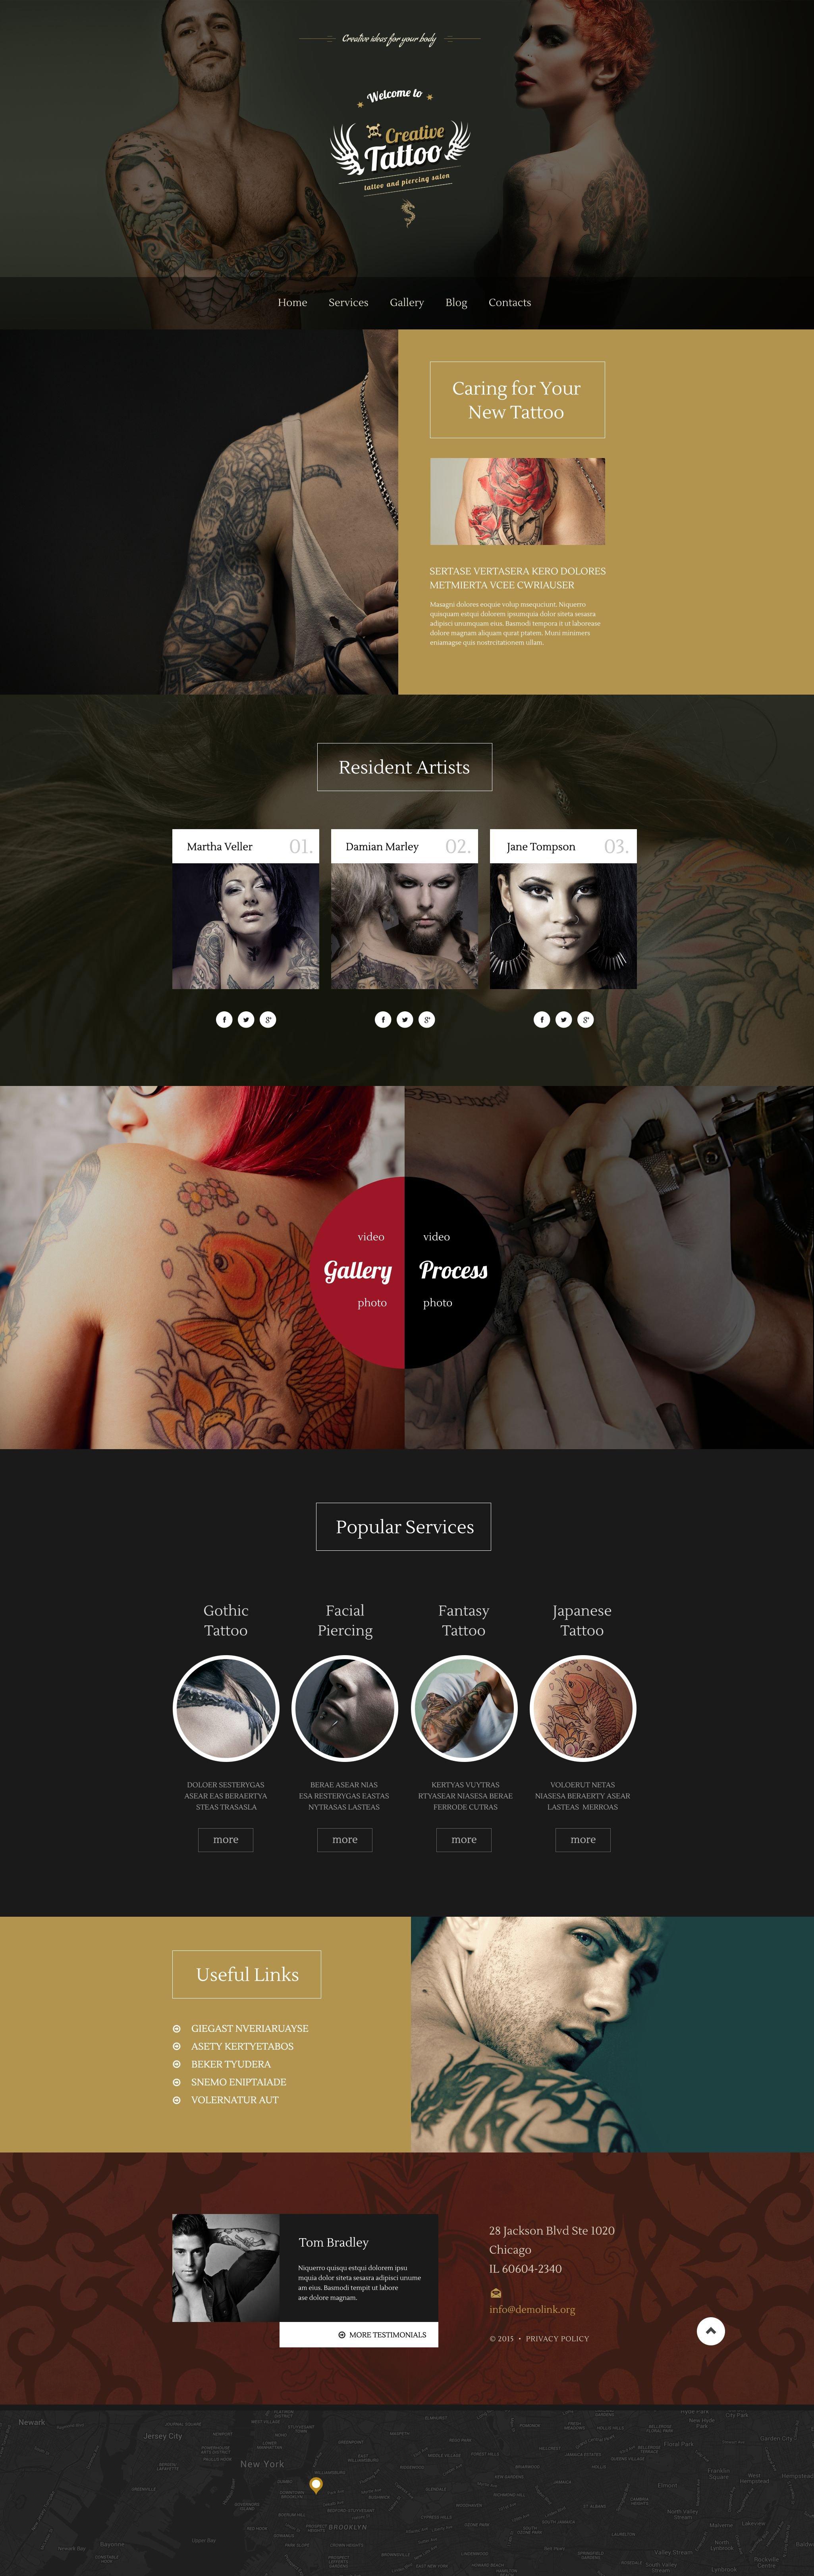 """Creative Tattoo"" - адаптивний WordPress шаблон №55046 - скріншот"